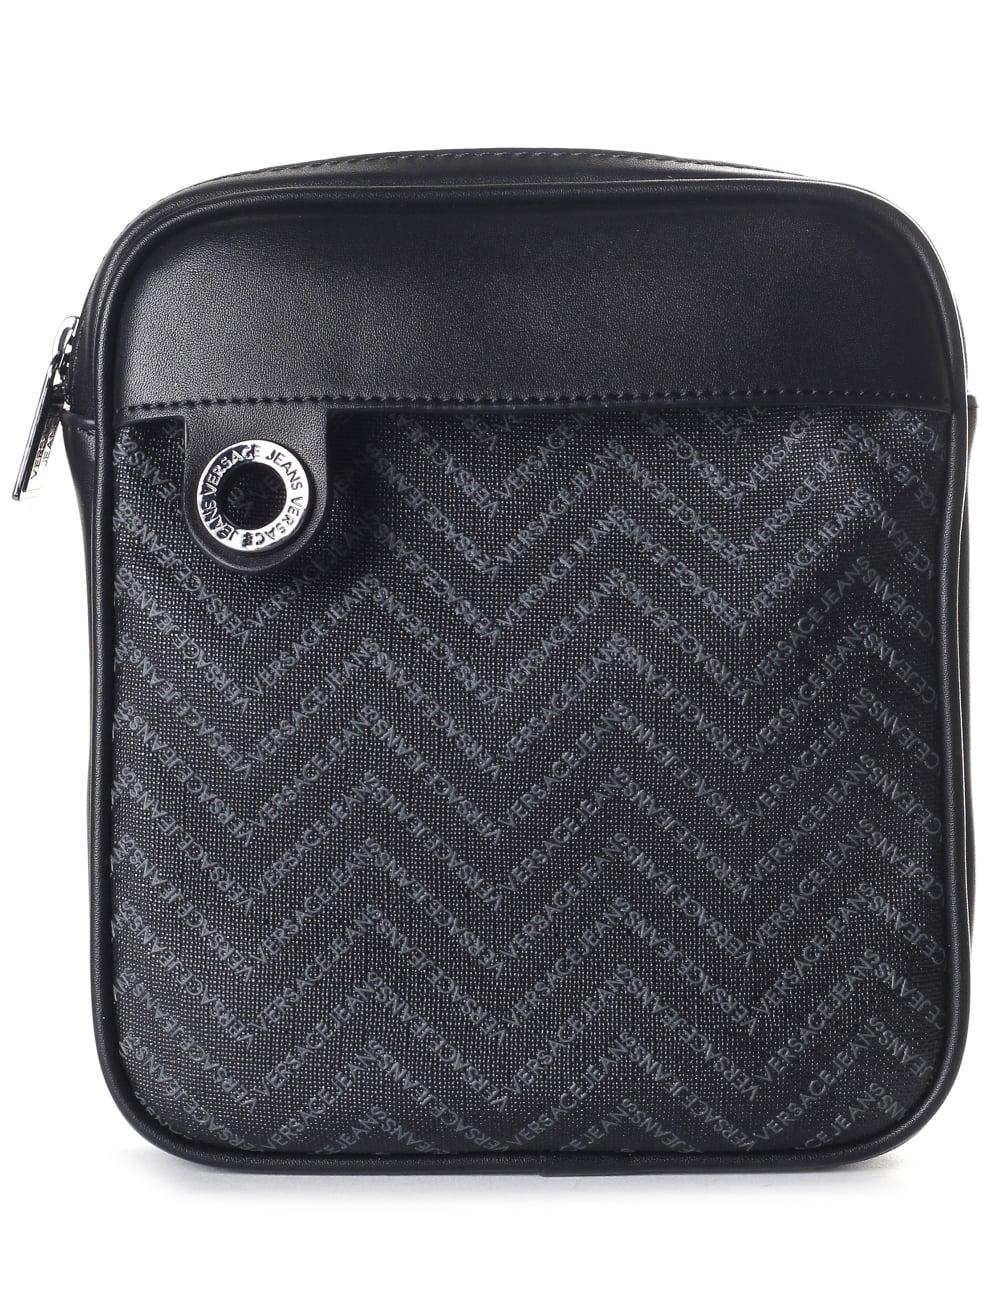 Versace Jeans Chevron Print Men s Crossbody Bag Black 776ebad9f21d0